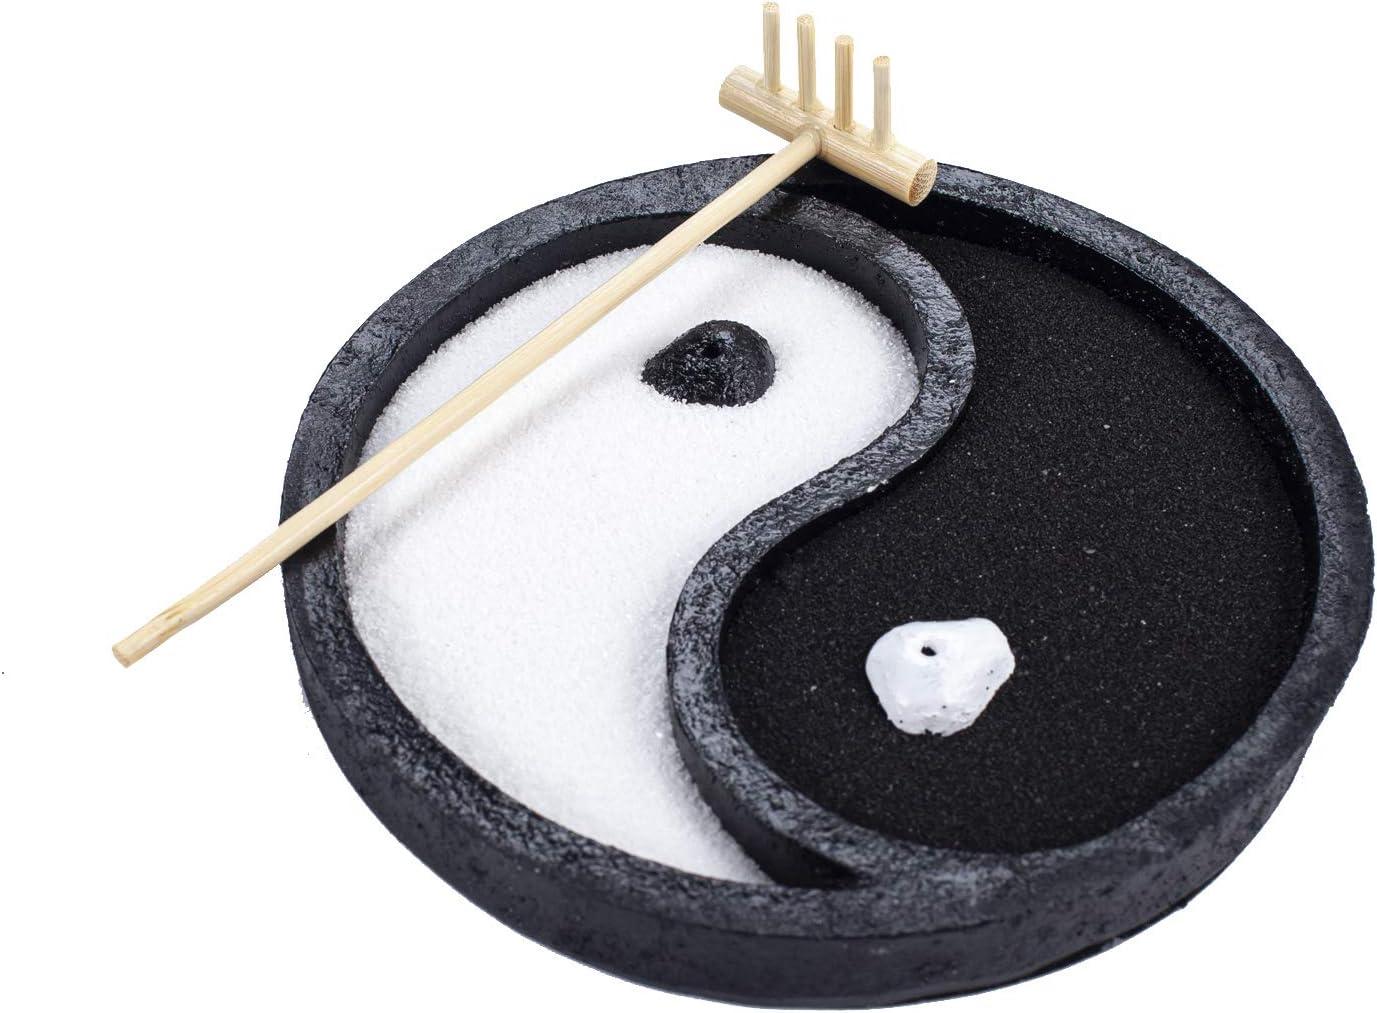 Mini Yin Yang Zen Garden Feng Shui Meditation Desktop Home Décor (GR014)